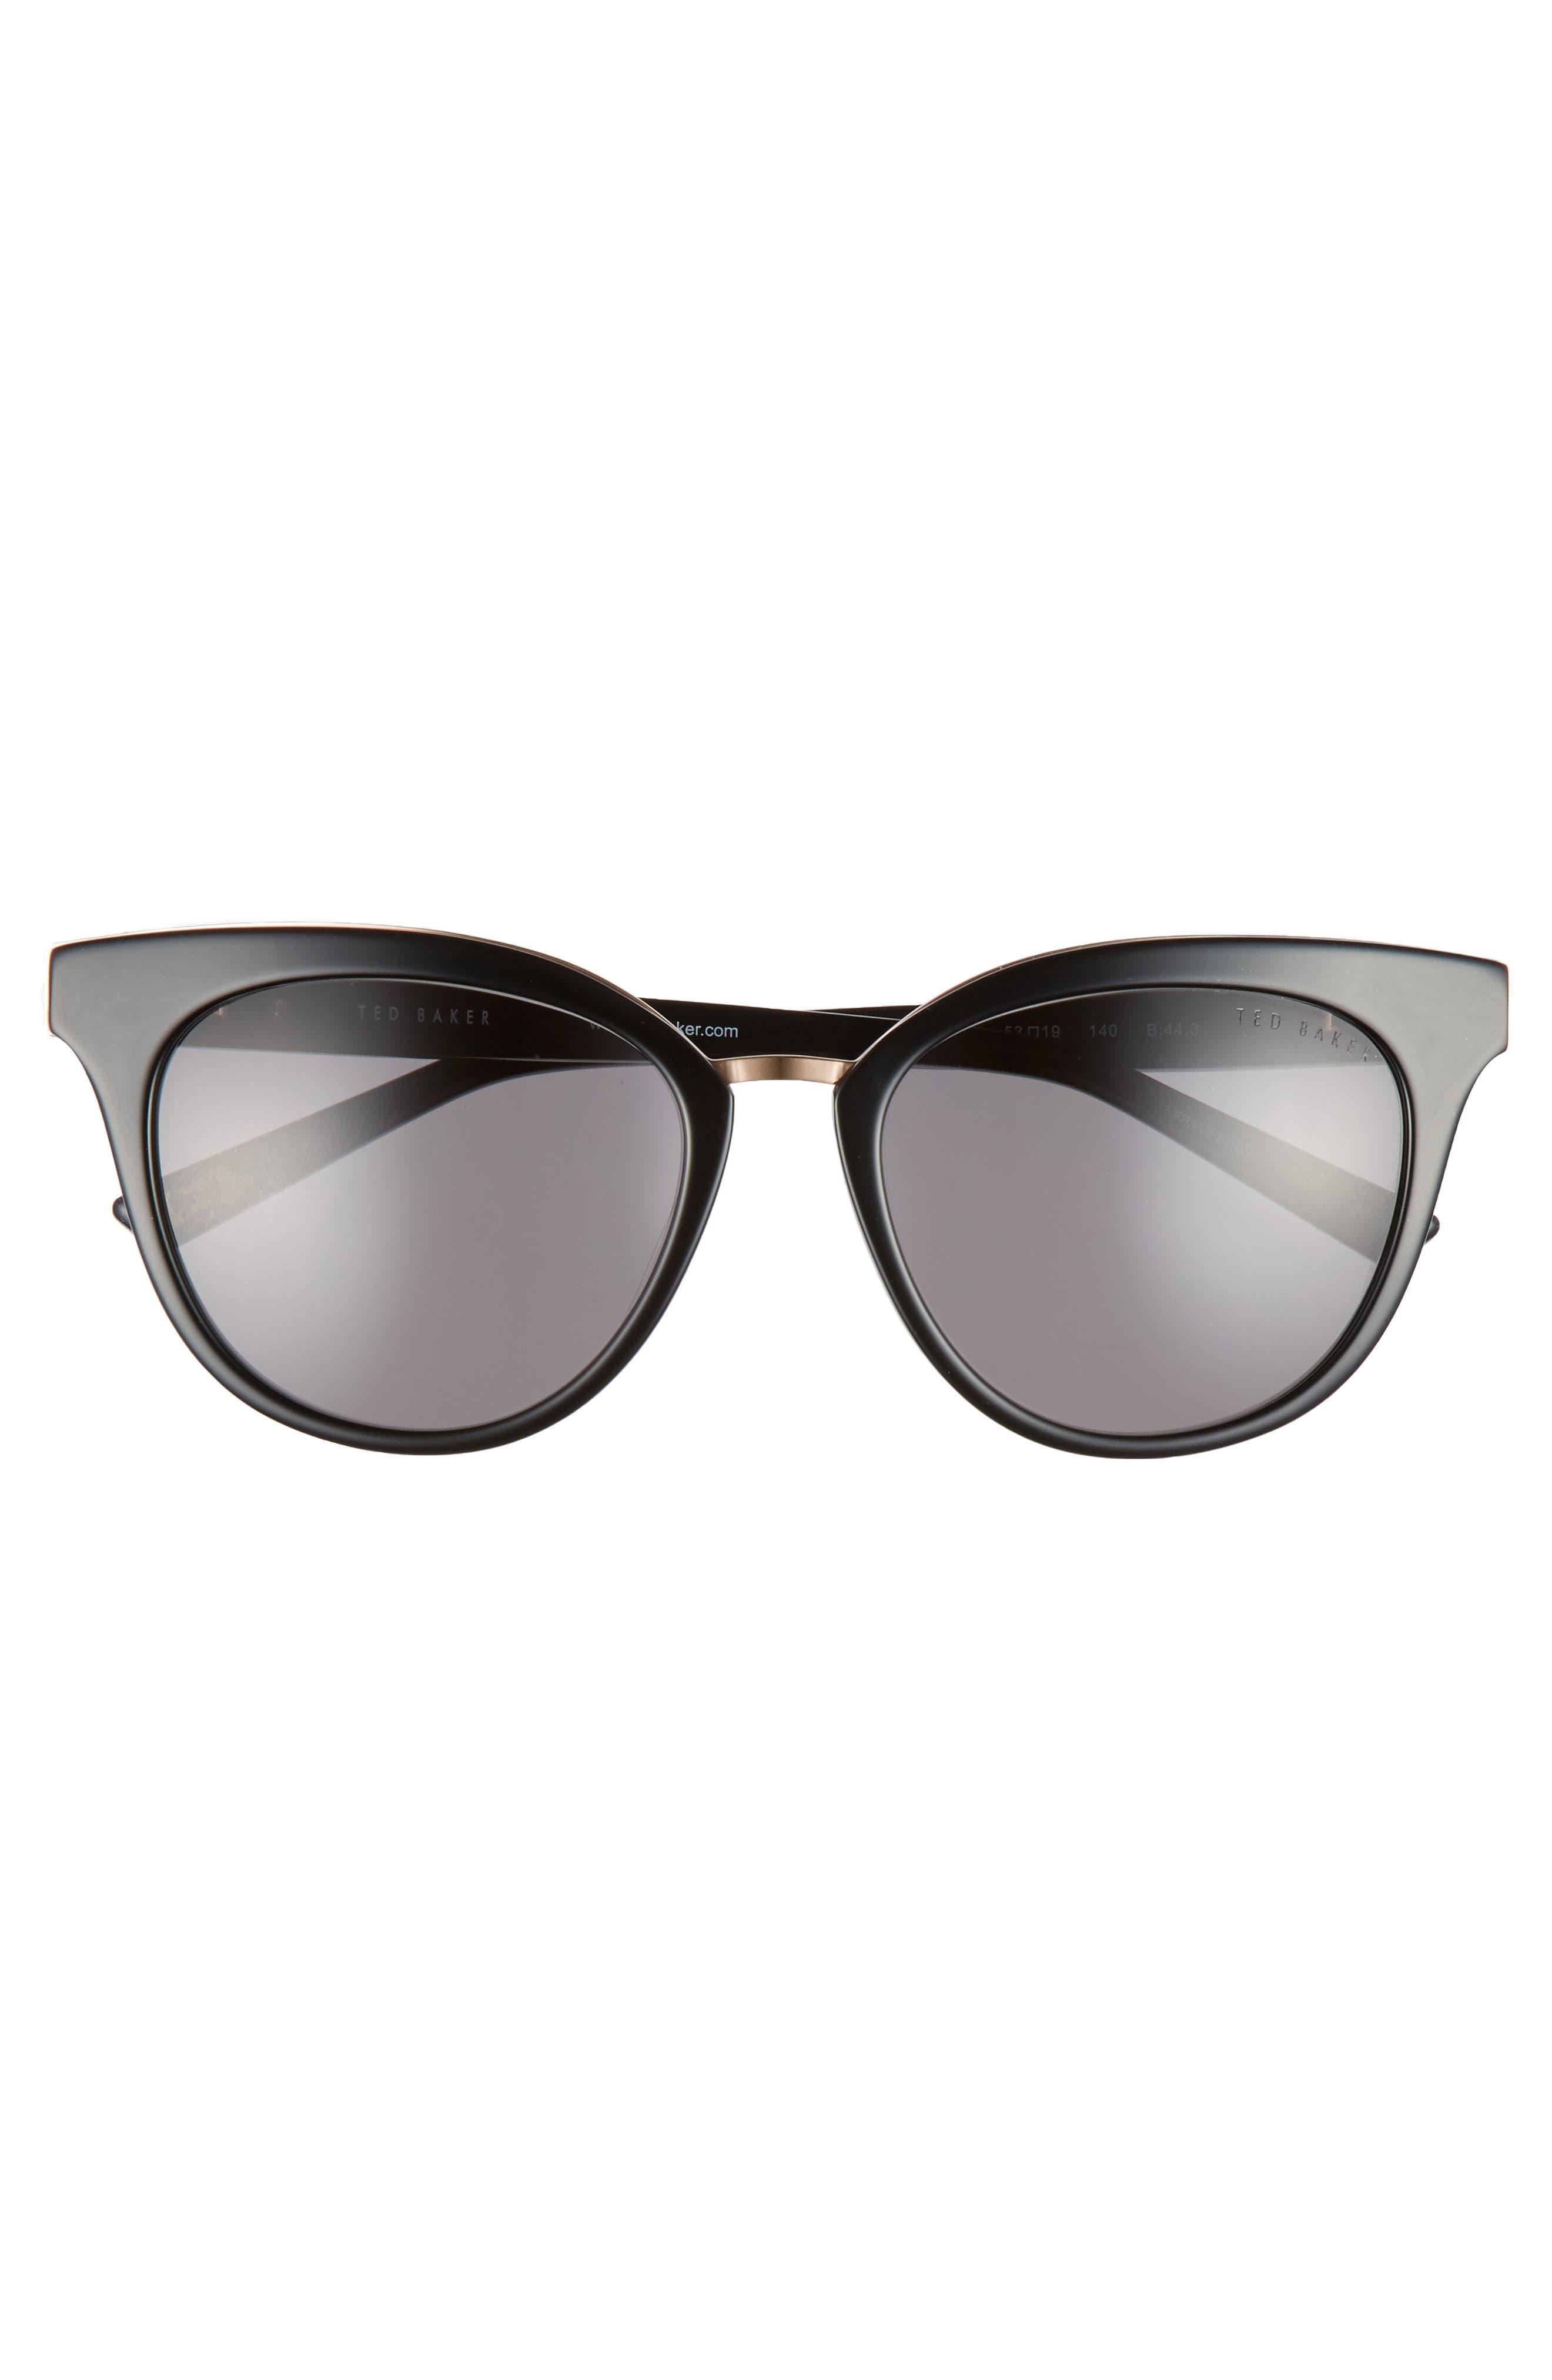 53mm Cat Eye Sunglasses,                             Alternate thumbnail 3, color,                             001